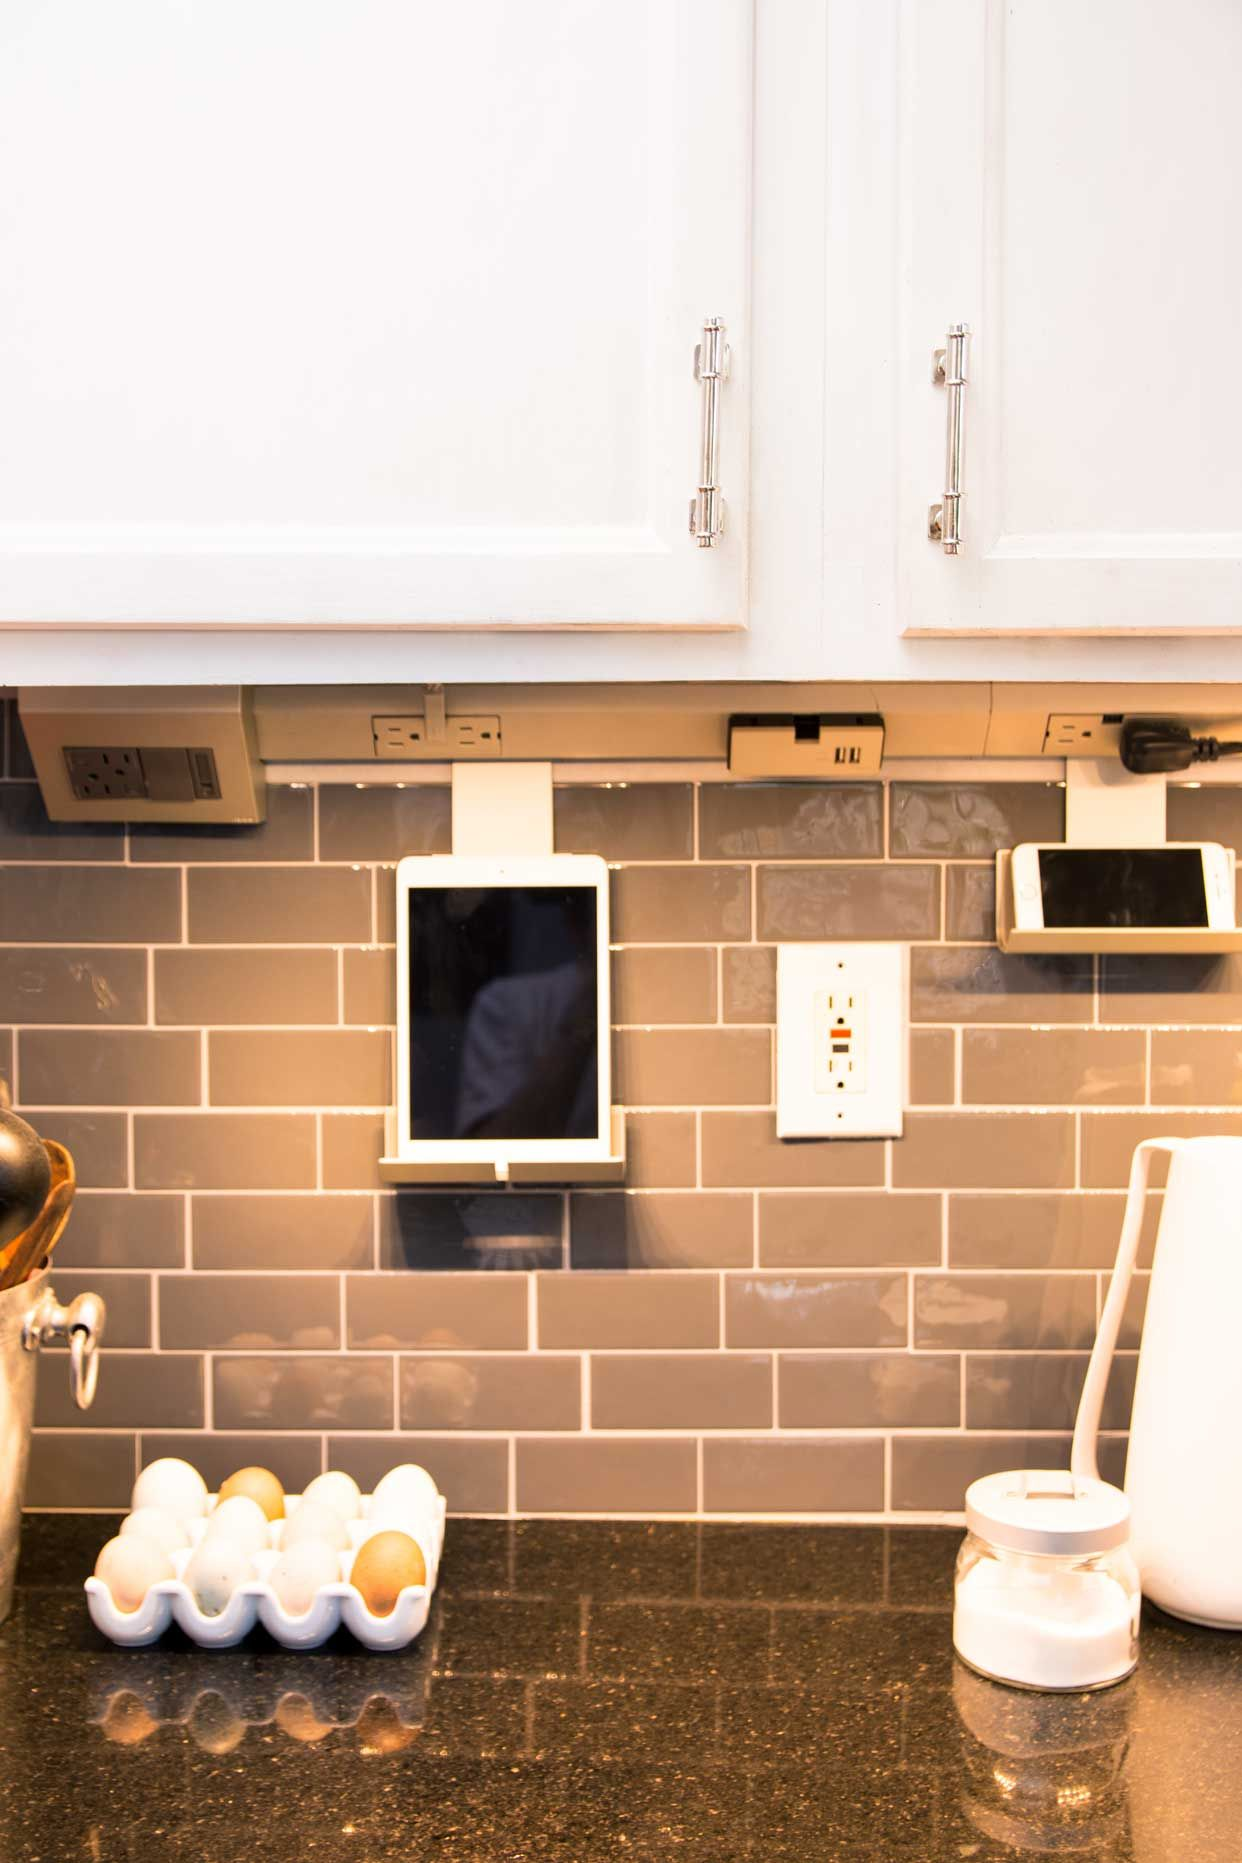 Undercabinet kitchen lighting with legrand